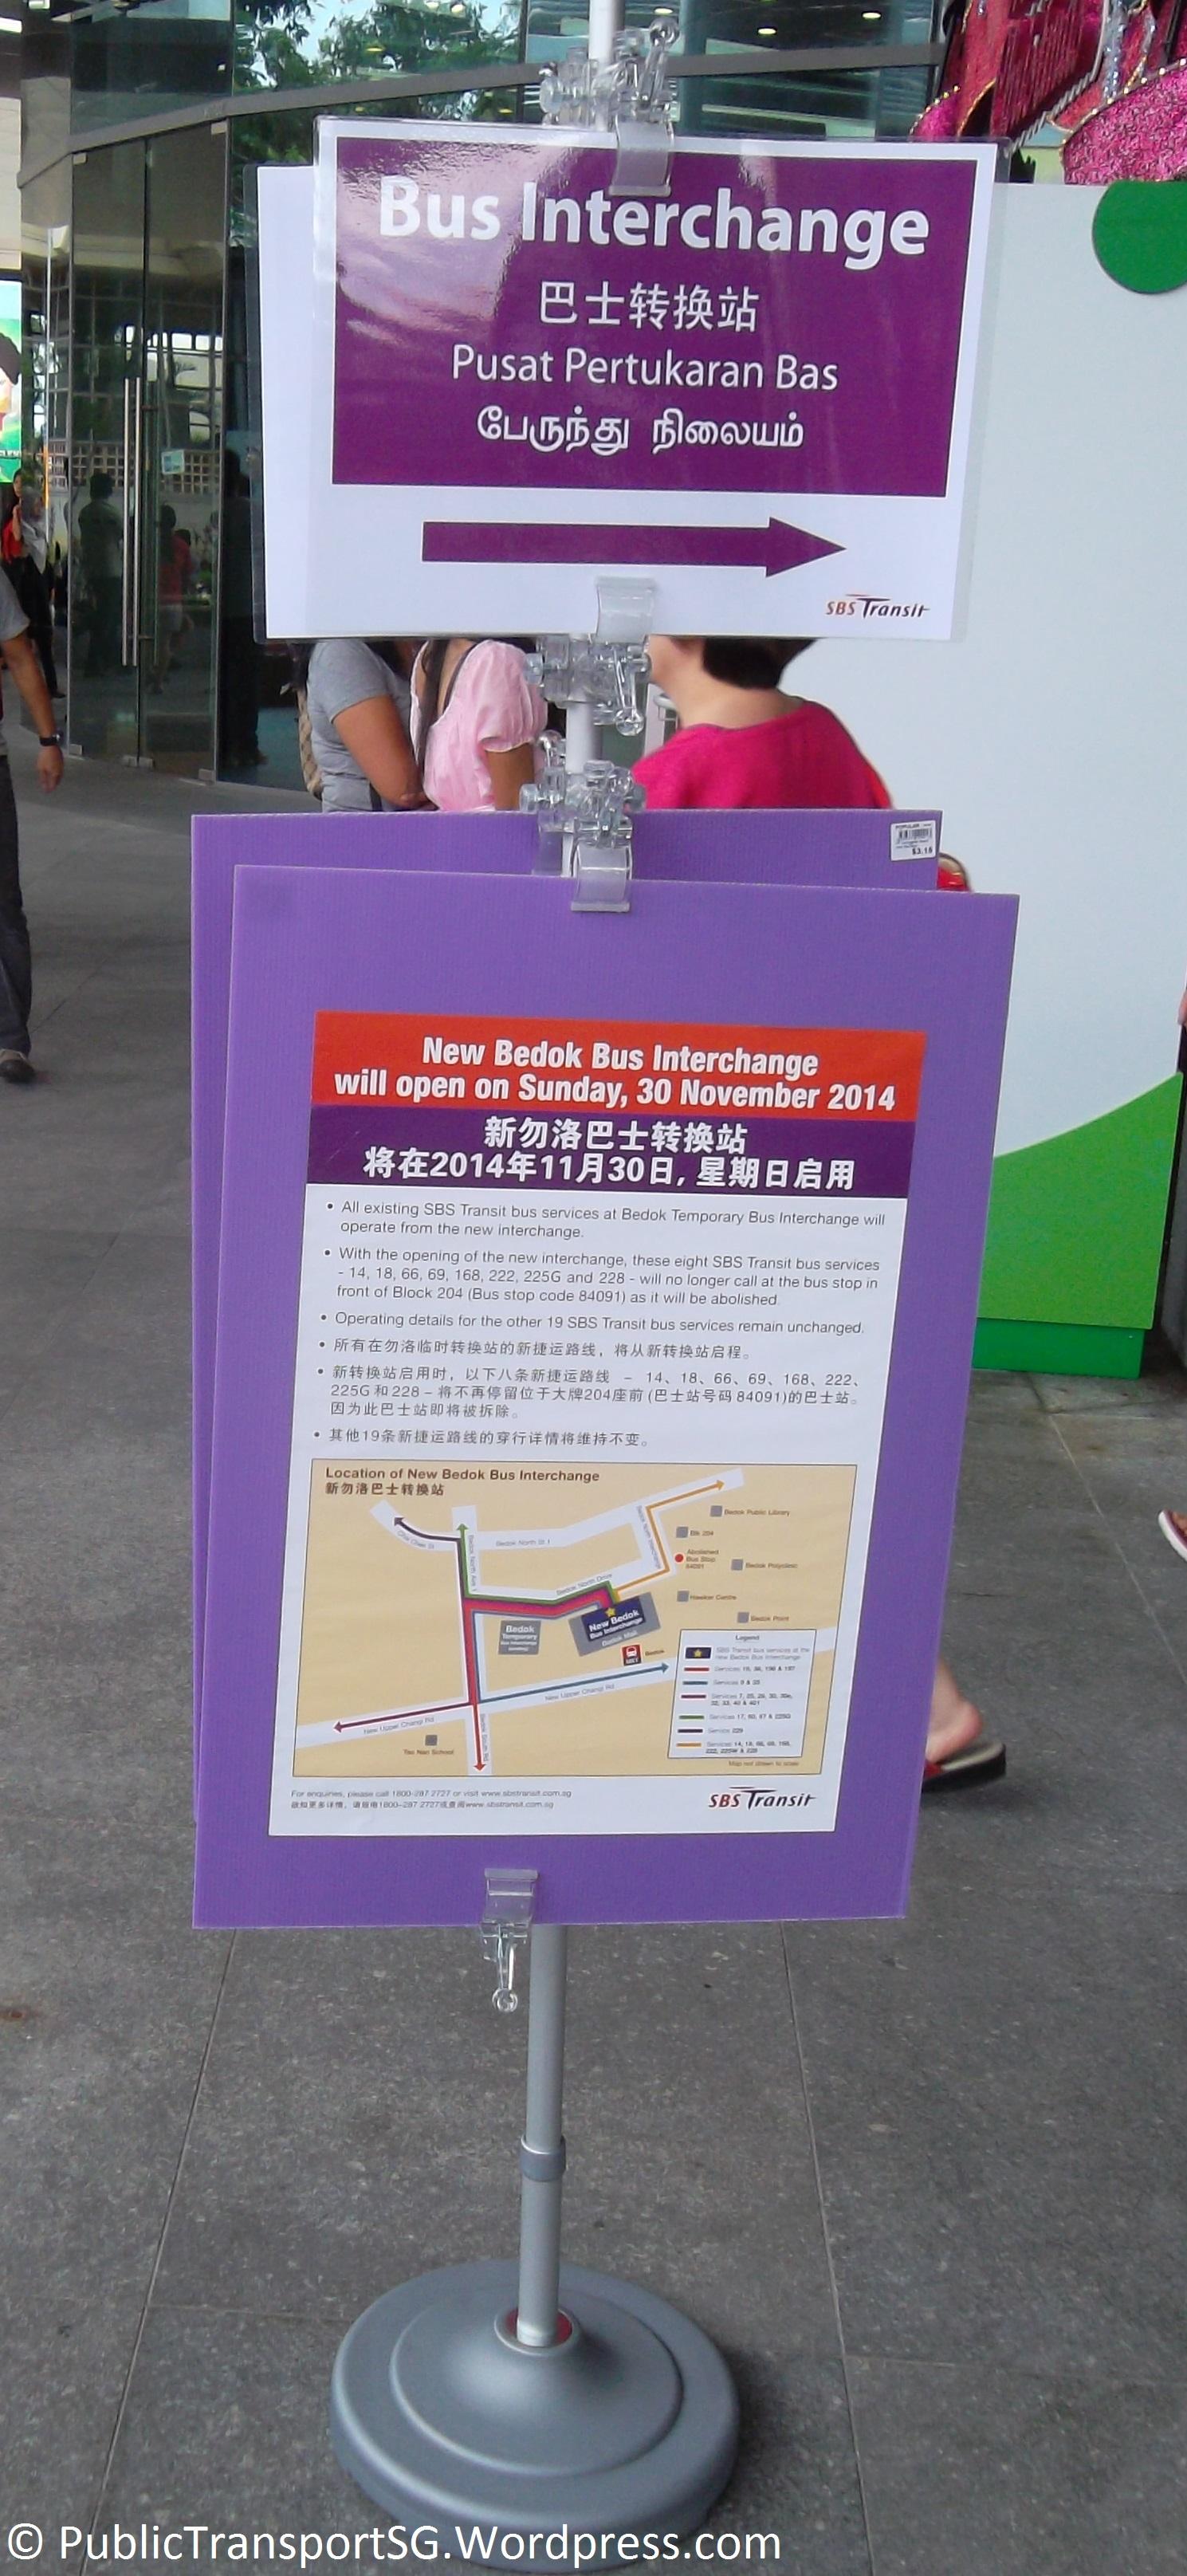 Signboard directing passengers to the new Bedok Bus Interchange